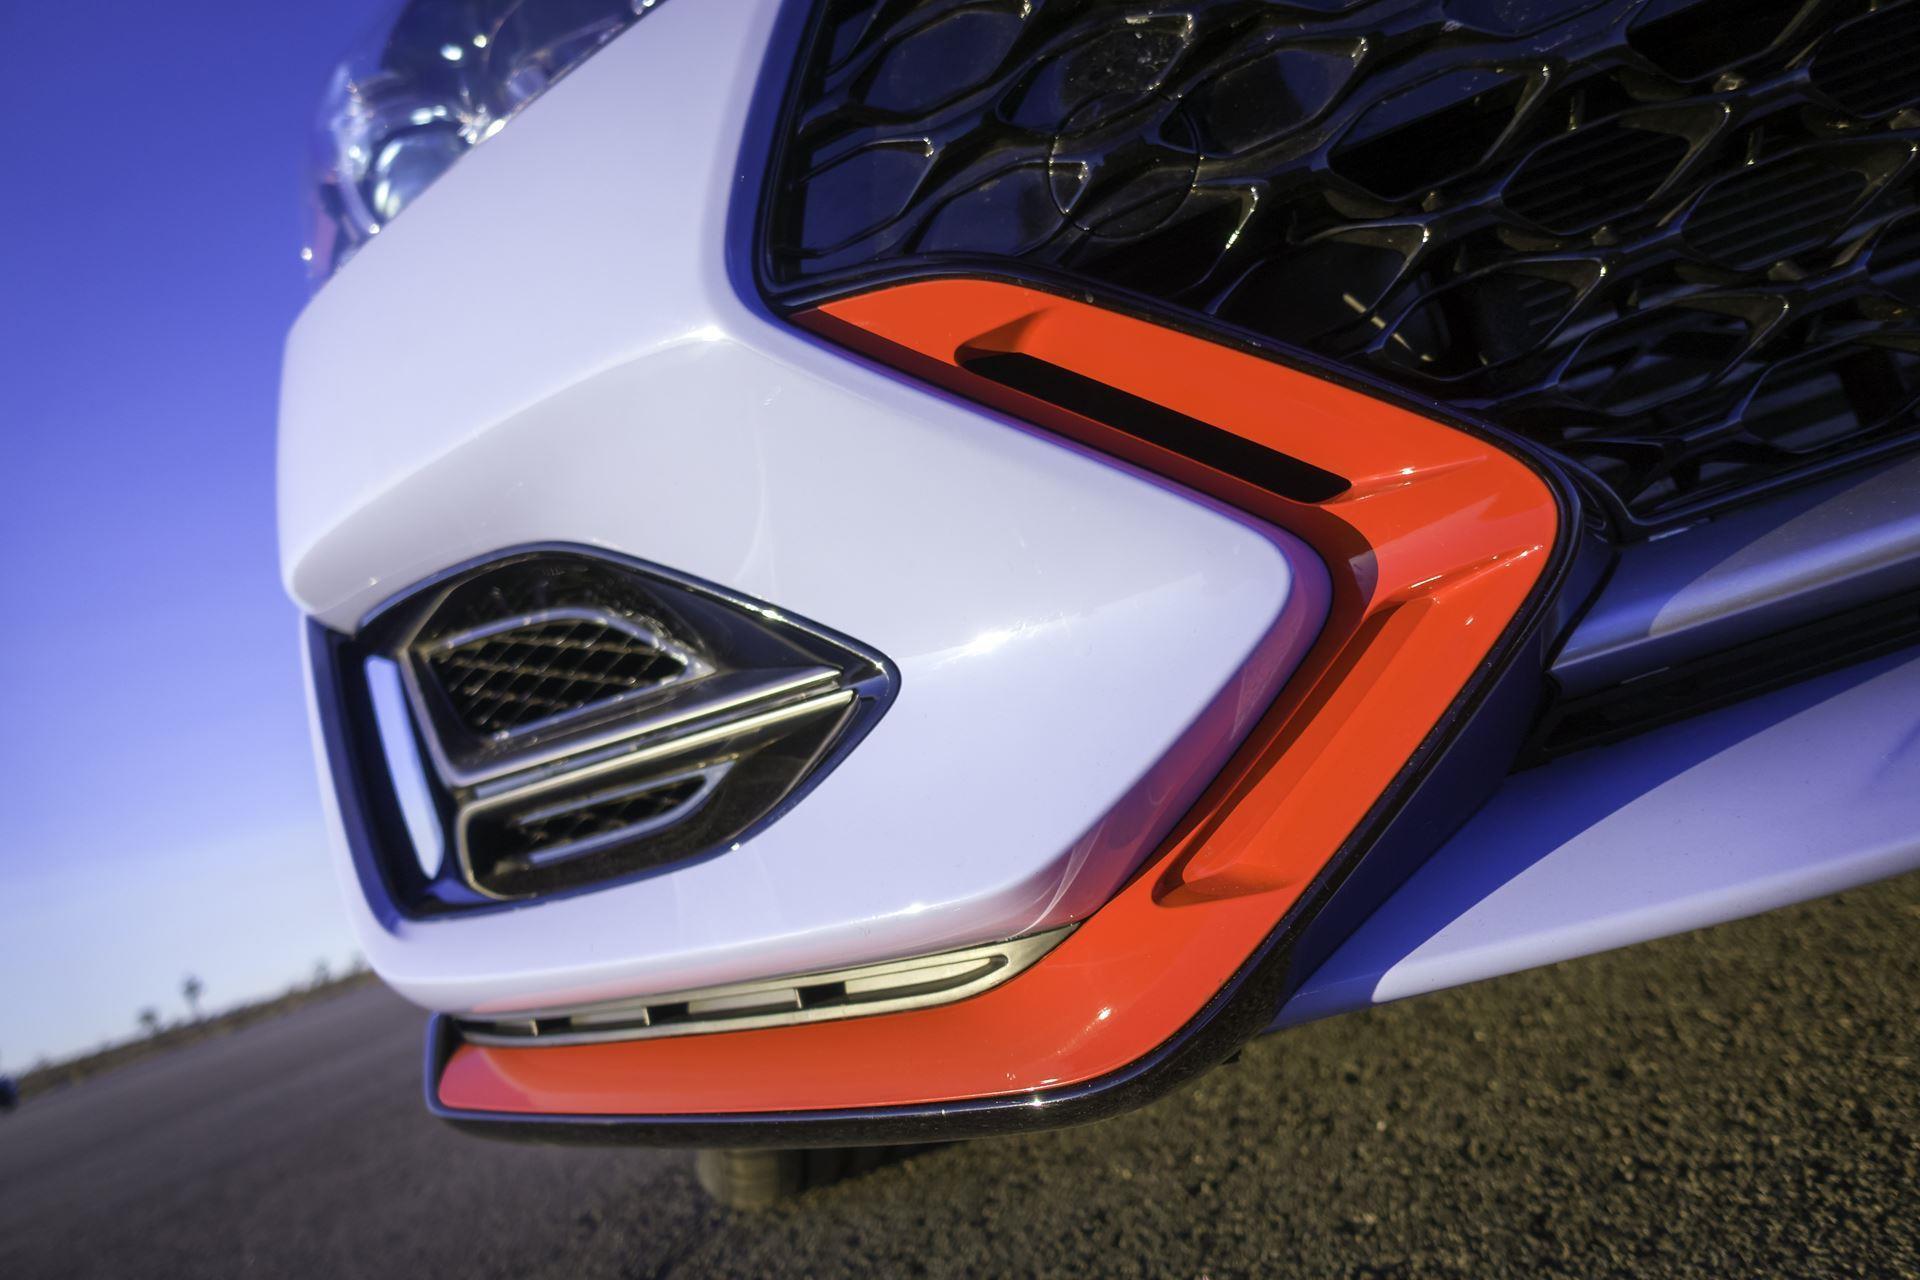 2019 Hyundai Veloster N Wallpapers Hd Drivespark